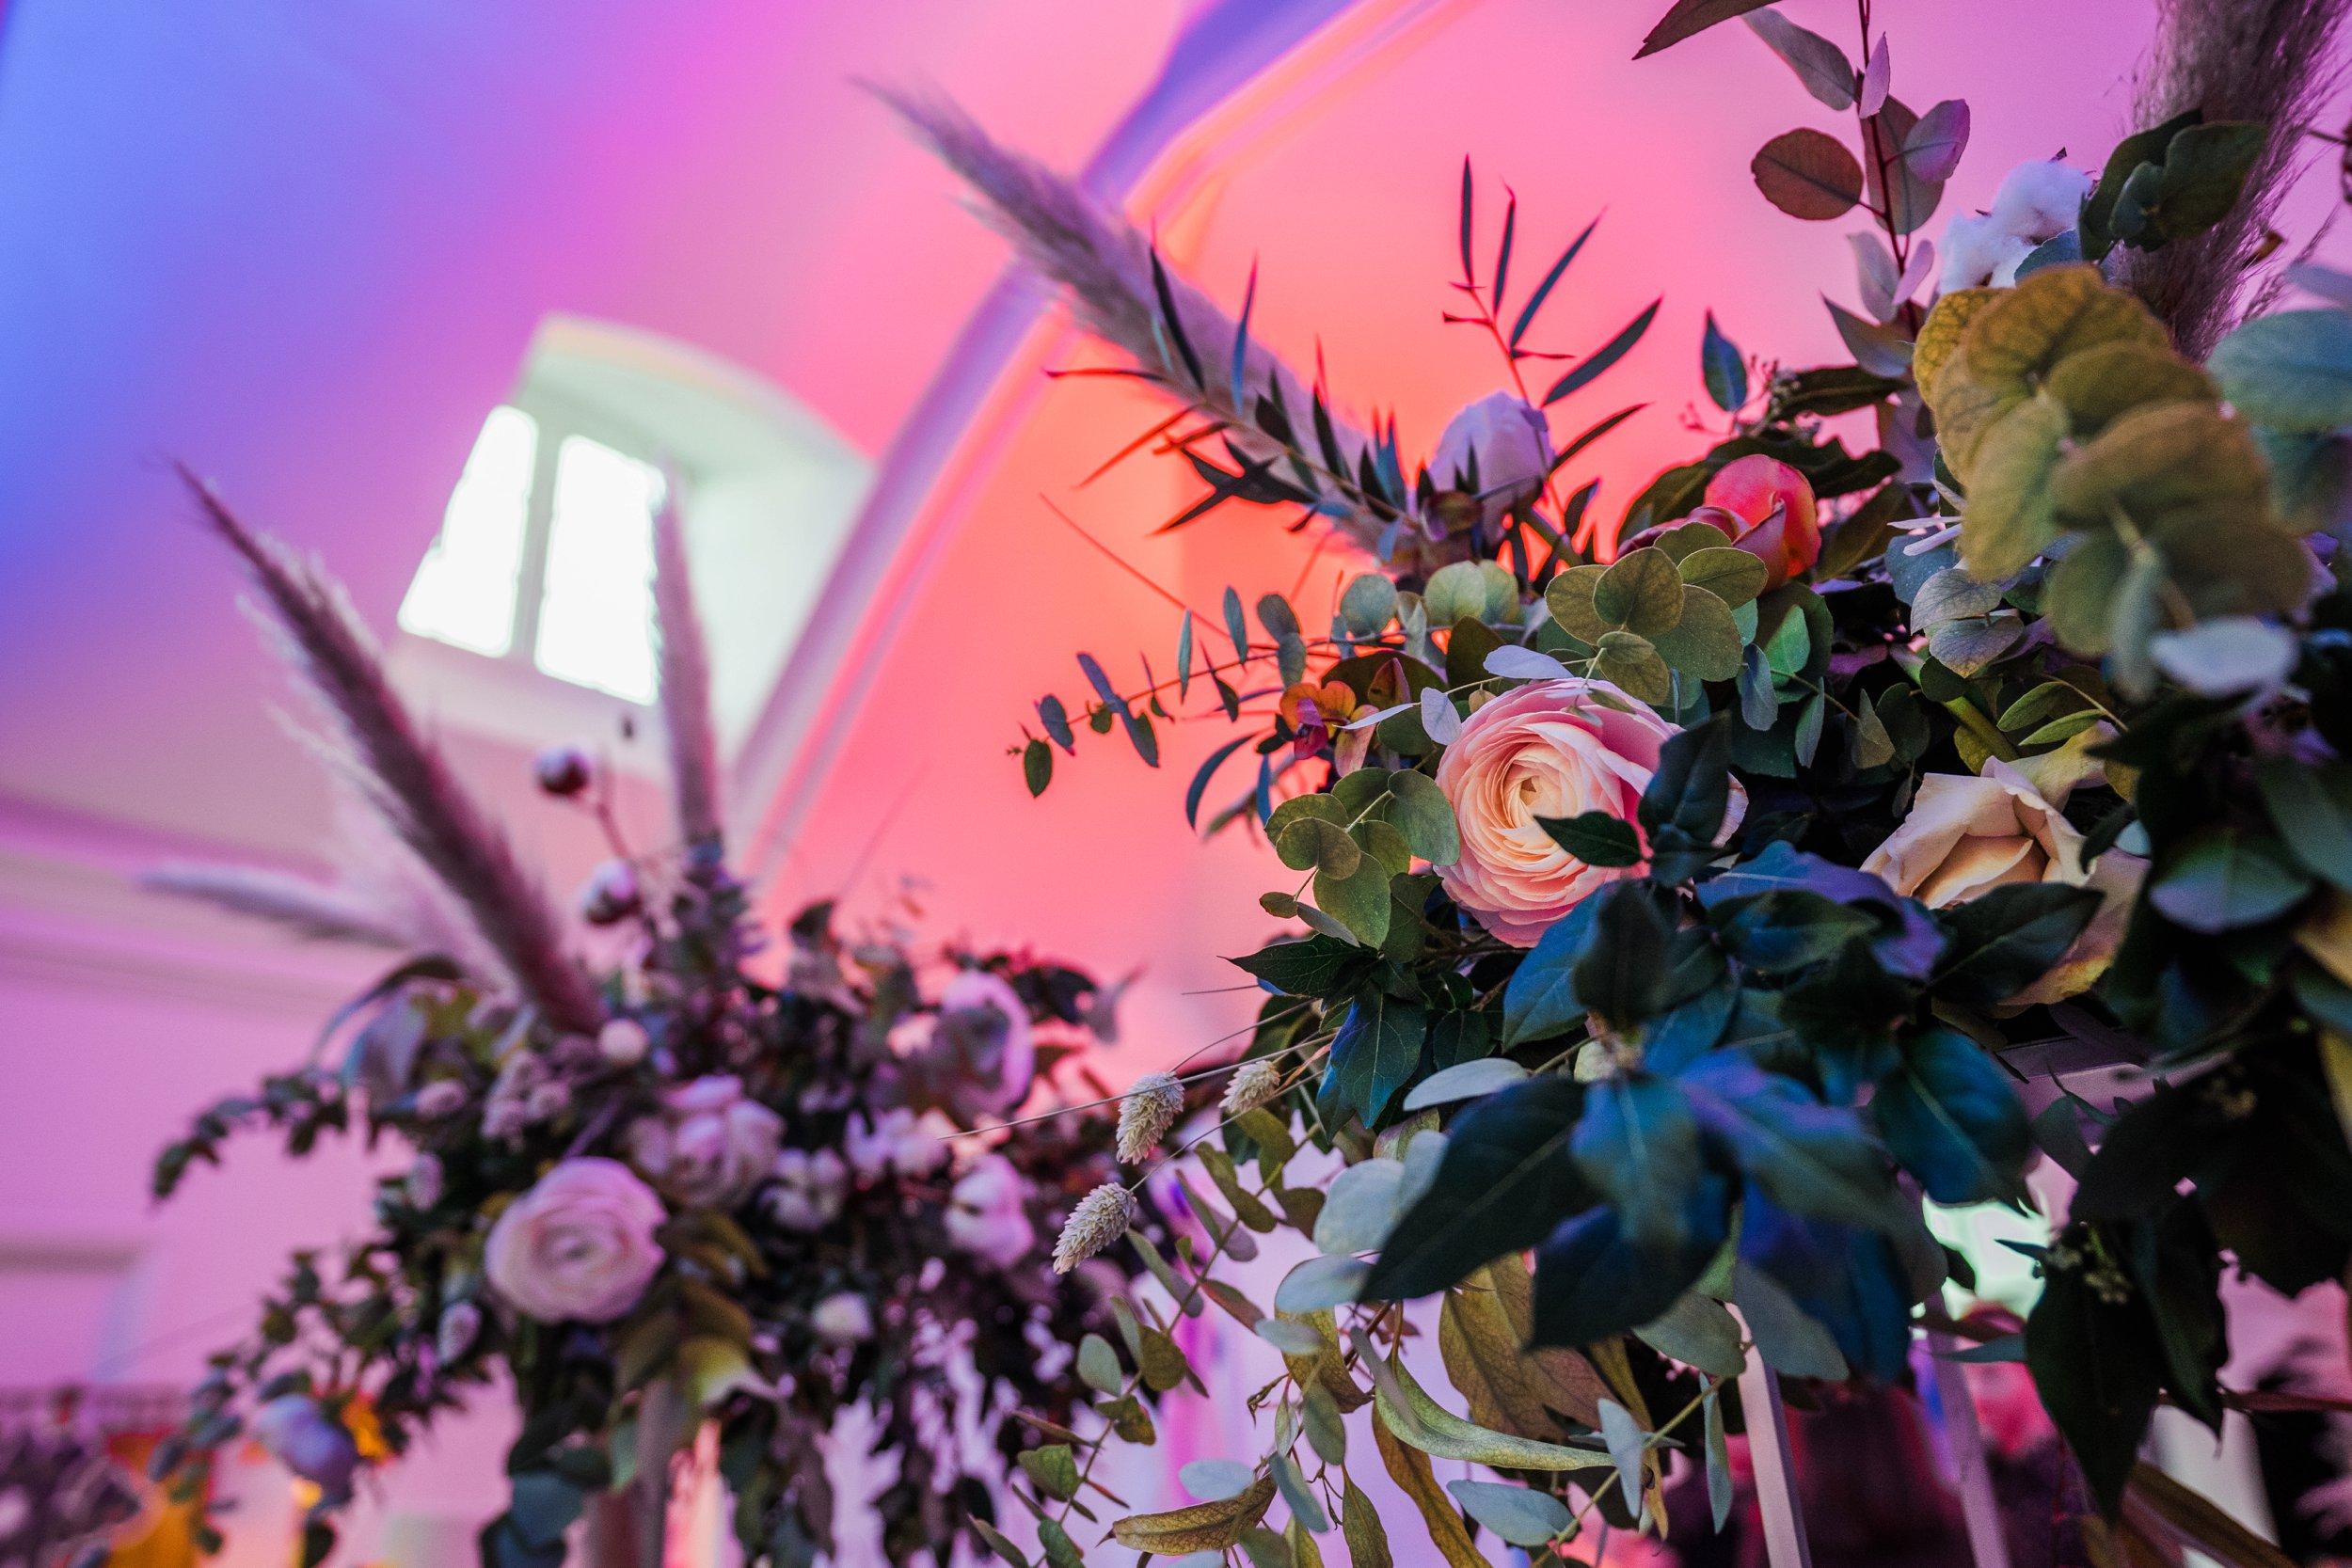 The UN-WEDDING SHOW 2019 cool bride style modern wedding fair London Core Clapton 00037.jpg